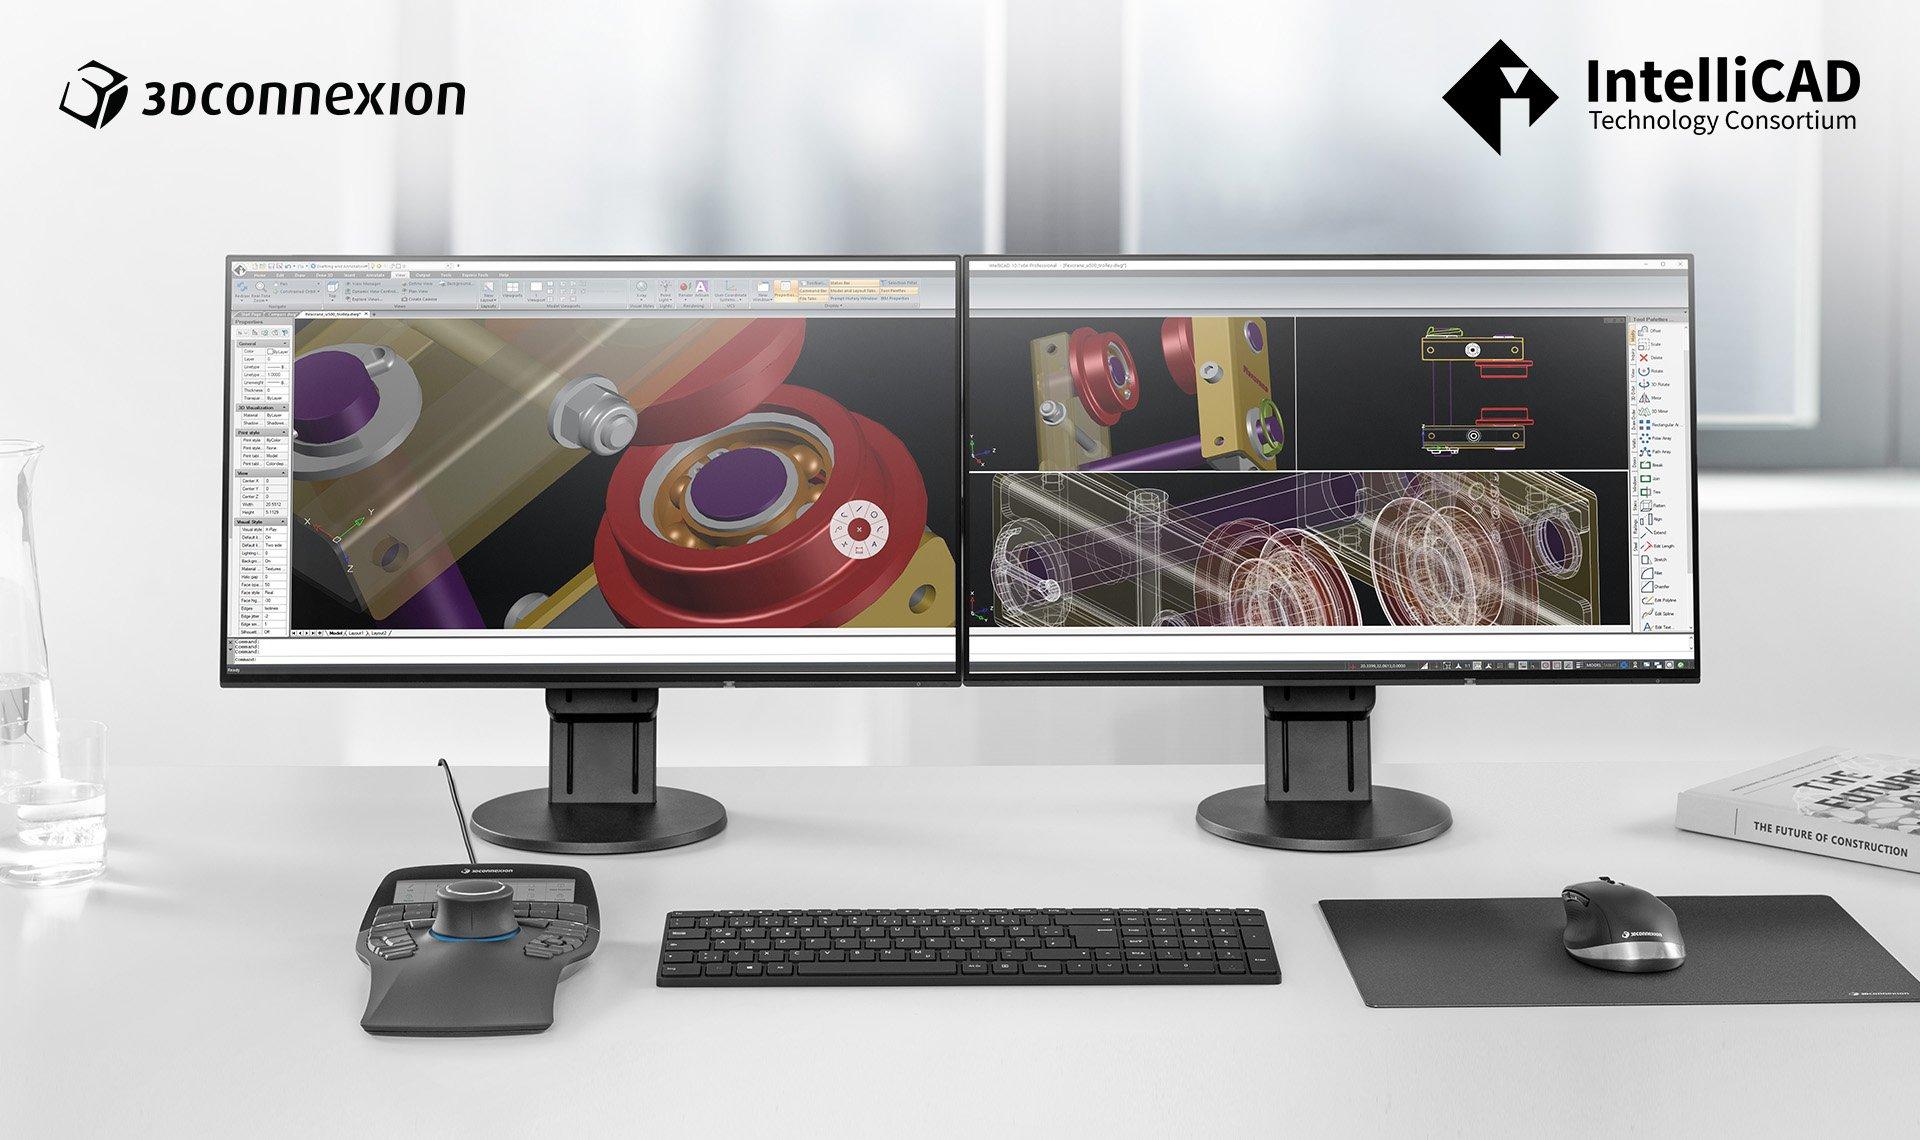 IntelliCAD-SpaceMouse Desktop Front